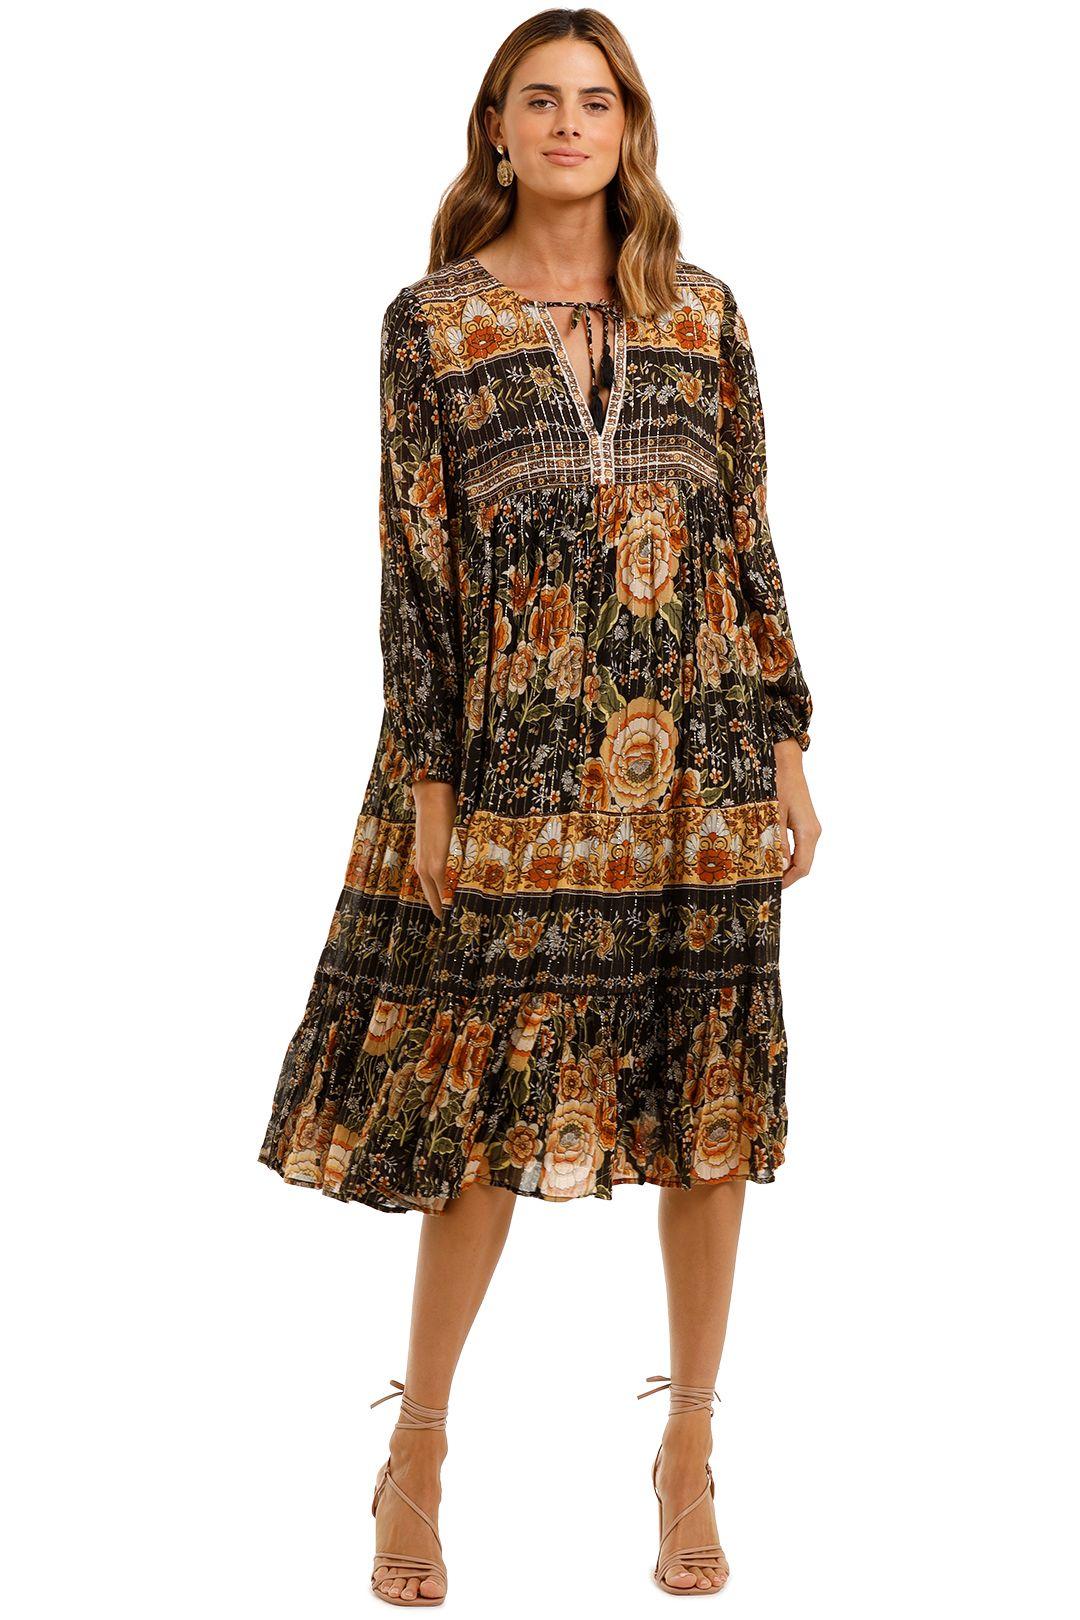 Mystic Boho Dress in Nightfall | Spell | GlamCorner